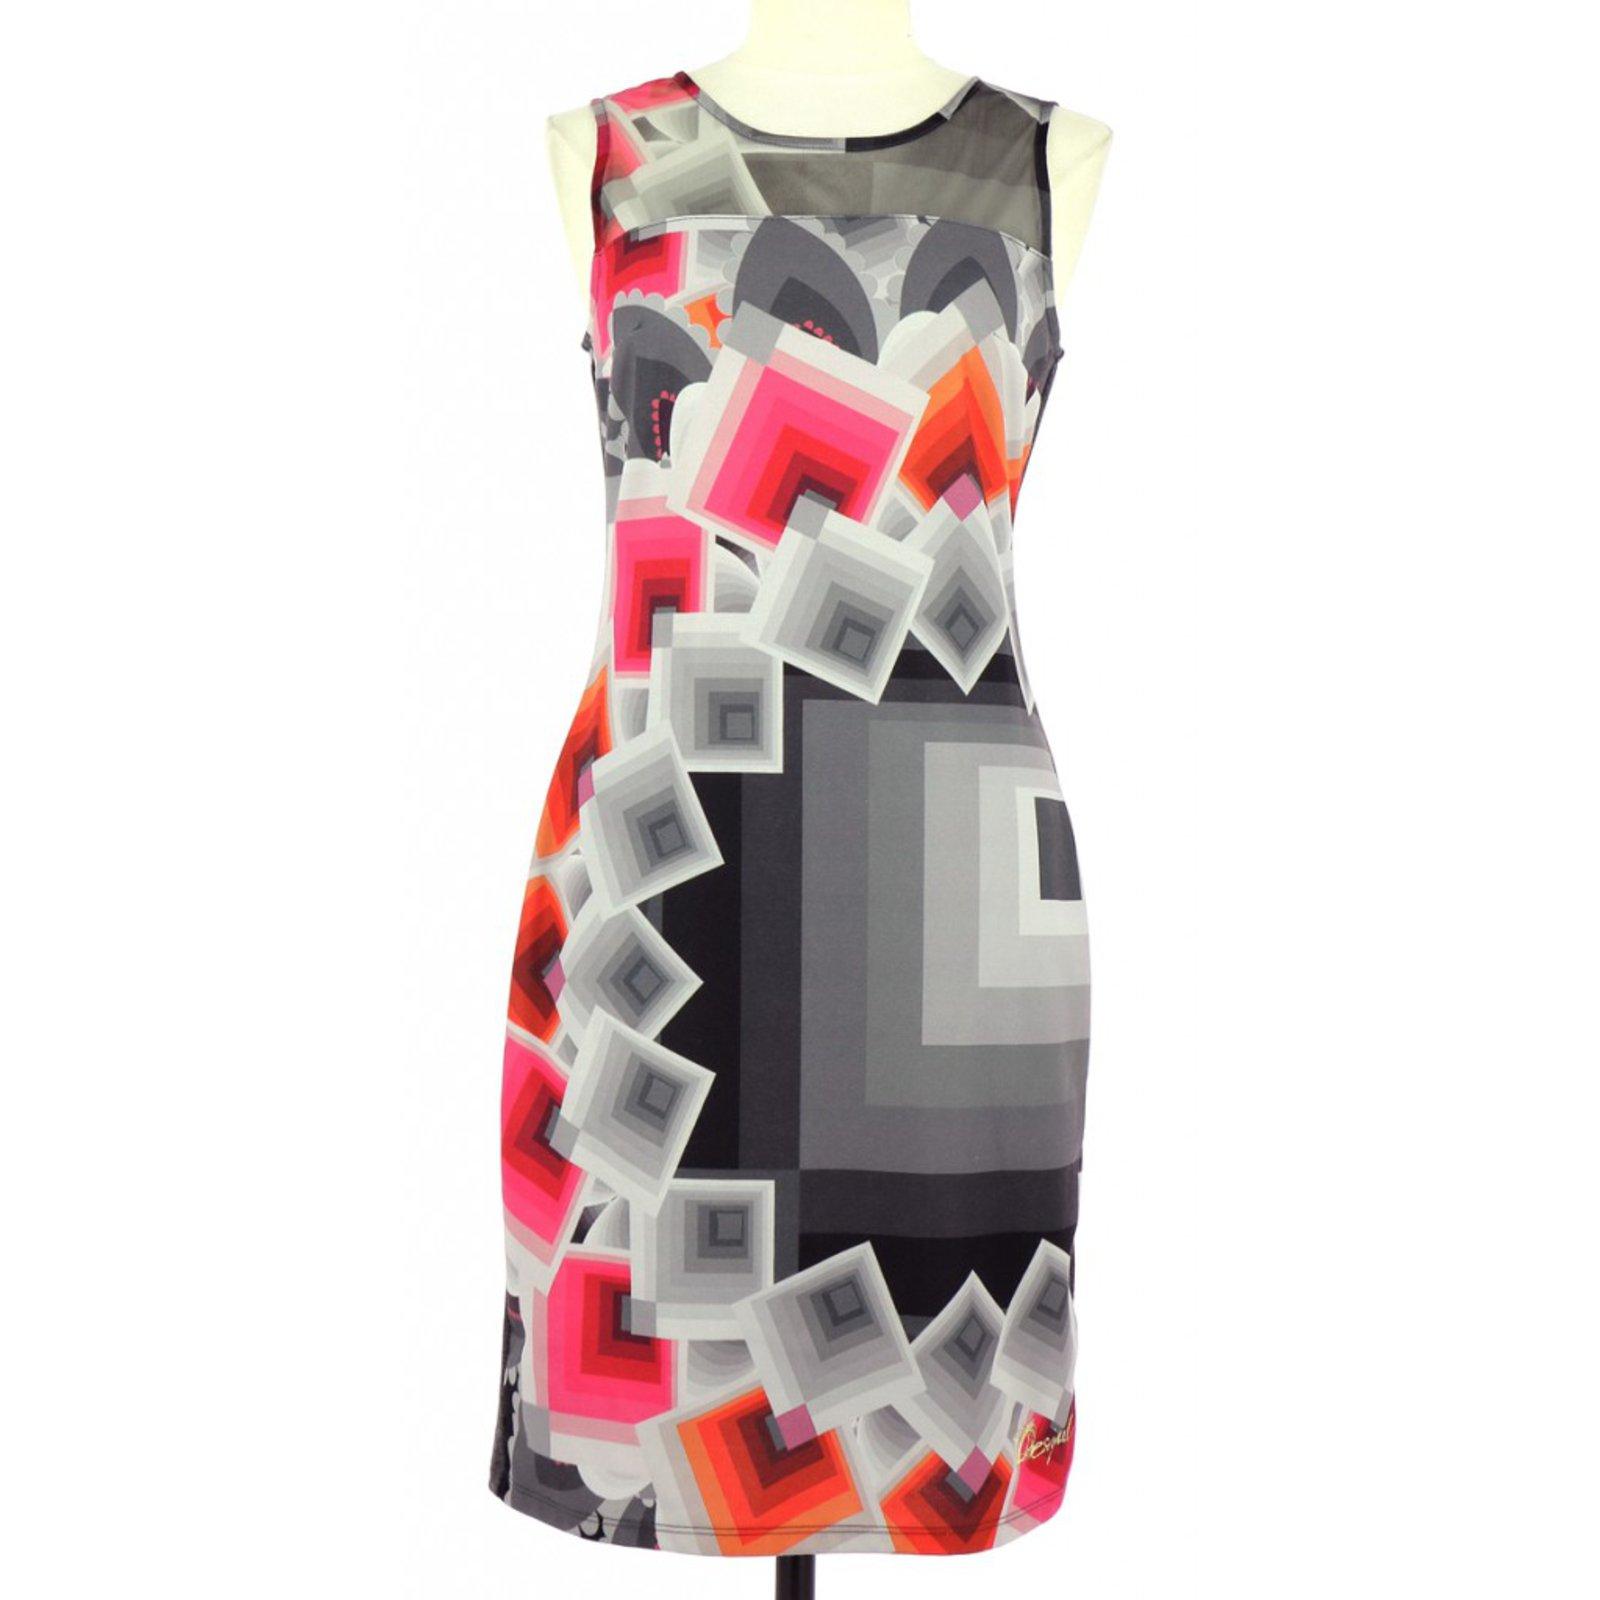 Robe Joli Robes Gris Desigual 80928 Closet Ref Polyester 1FKTlJc